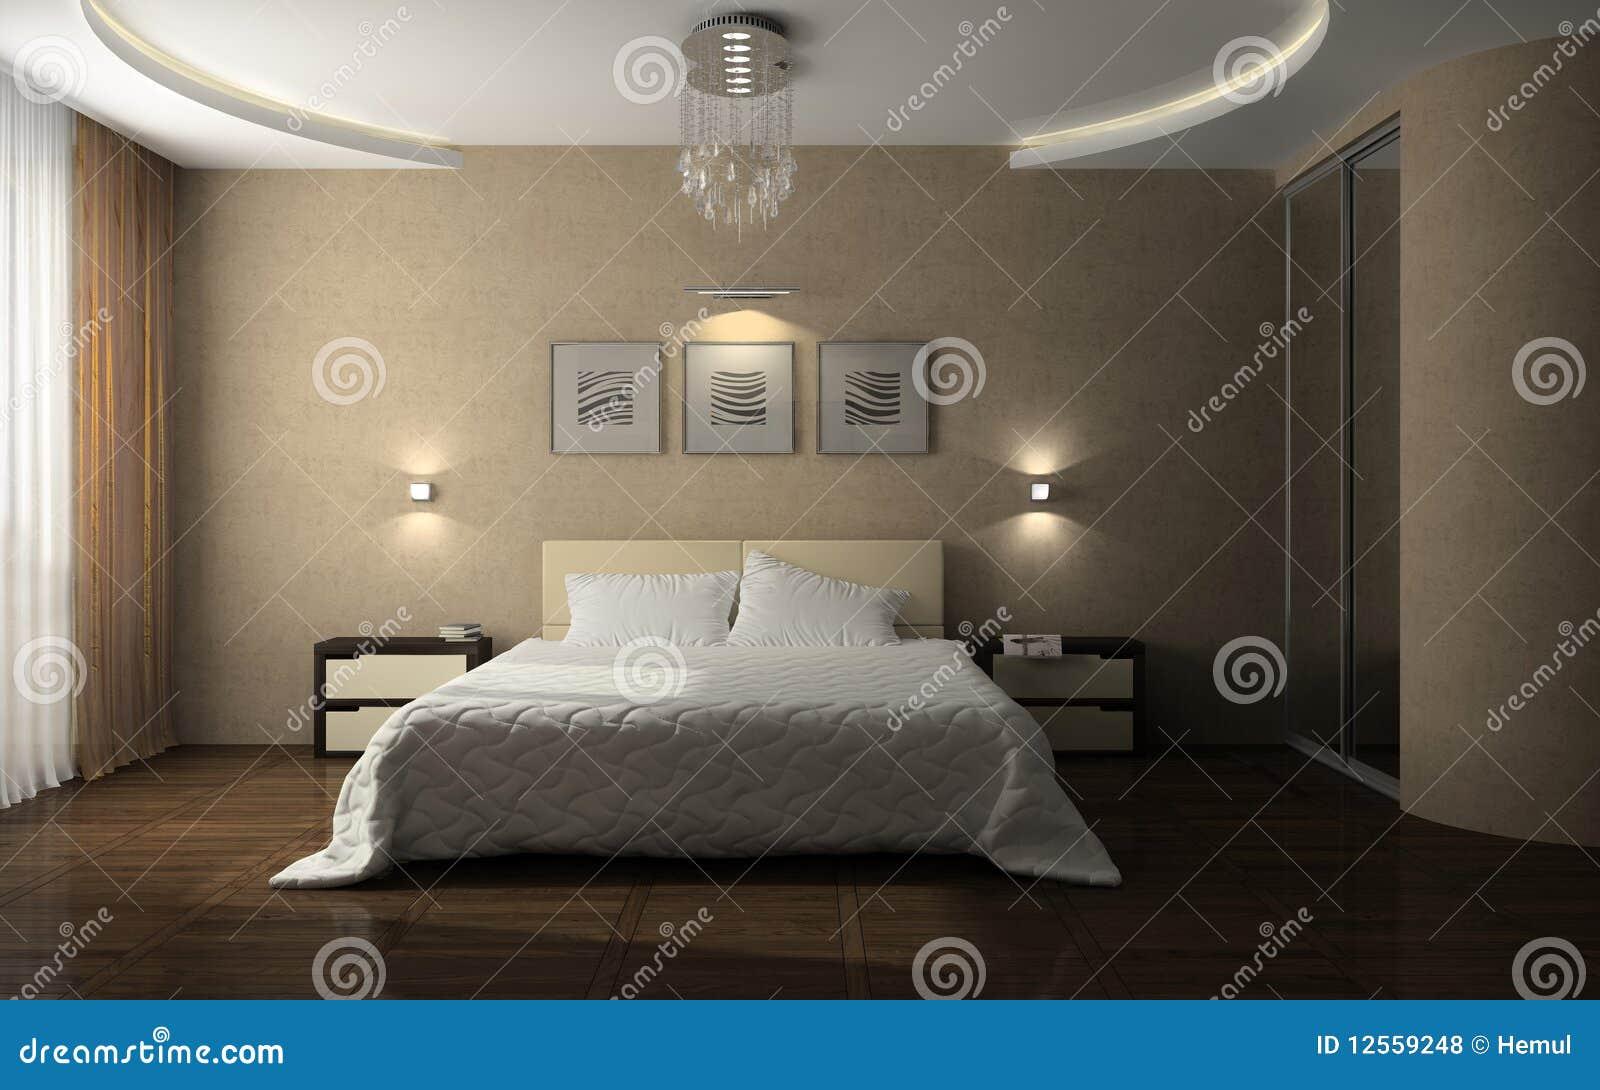 Interior Of The Stylish Bedroom Royalty Free Stock Photos